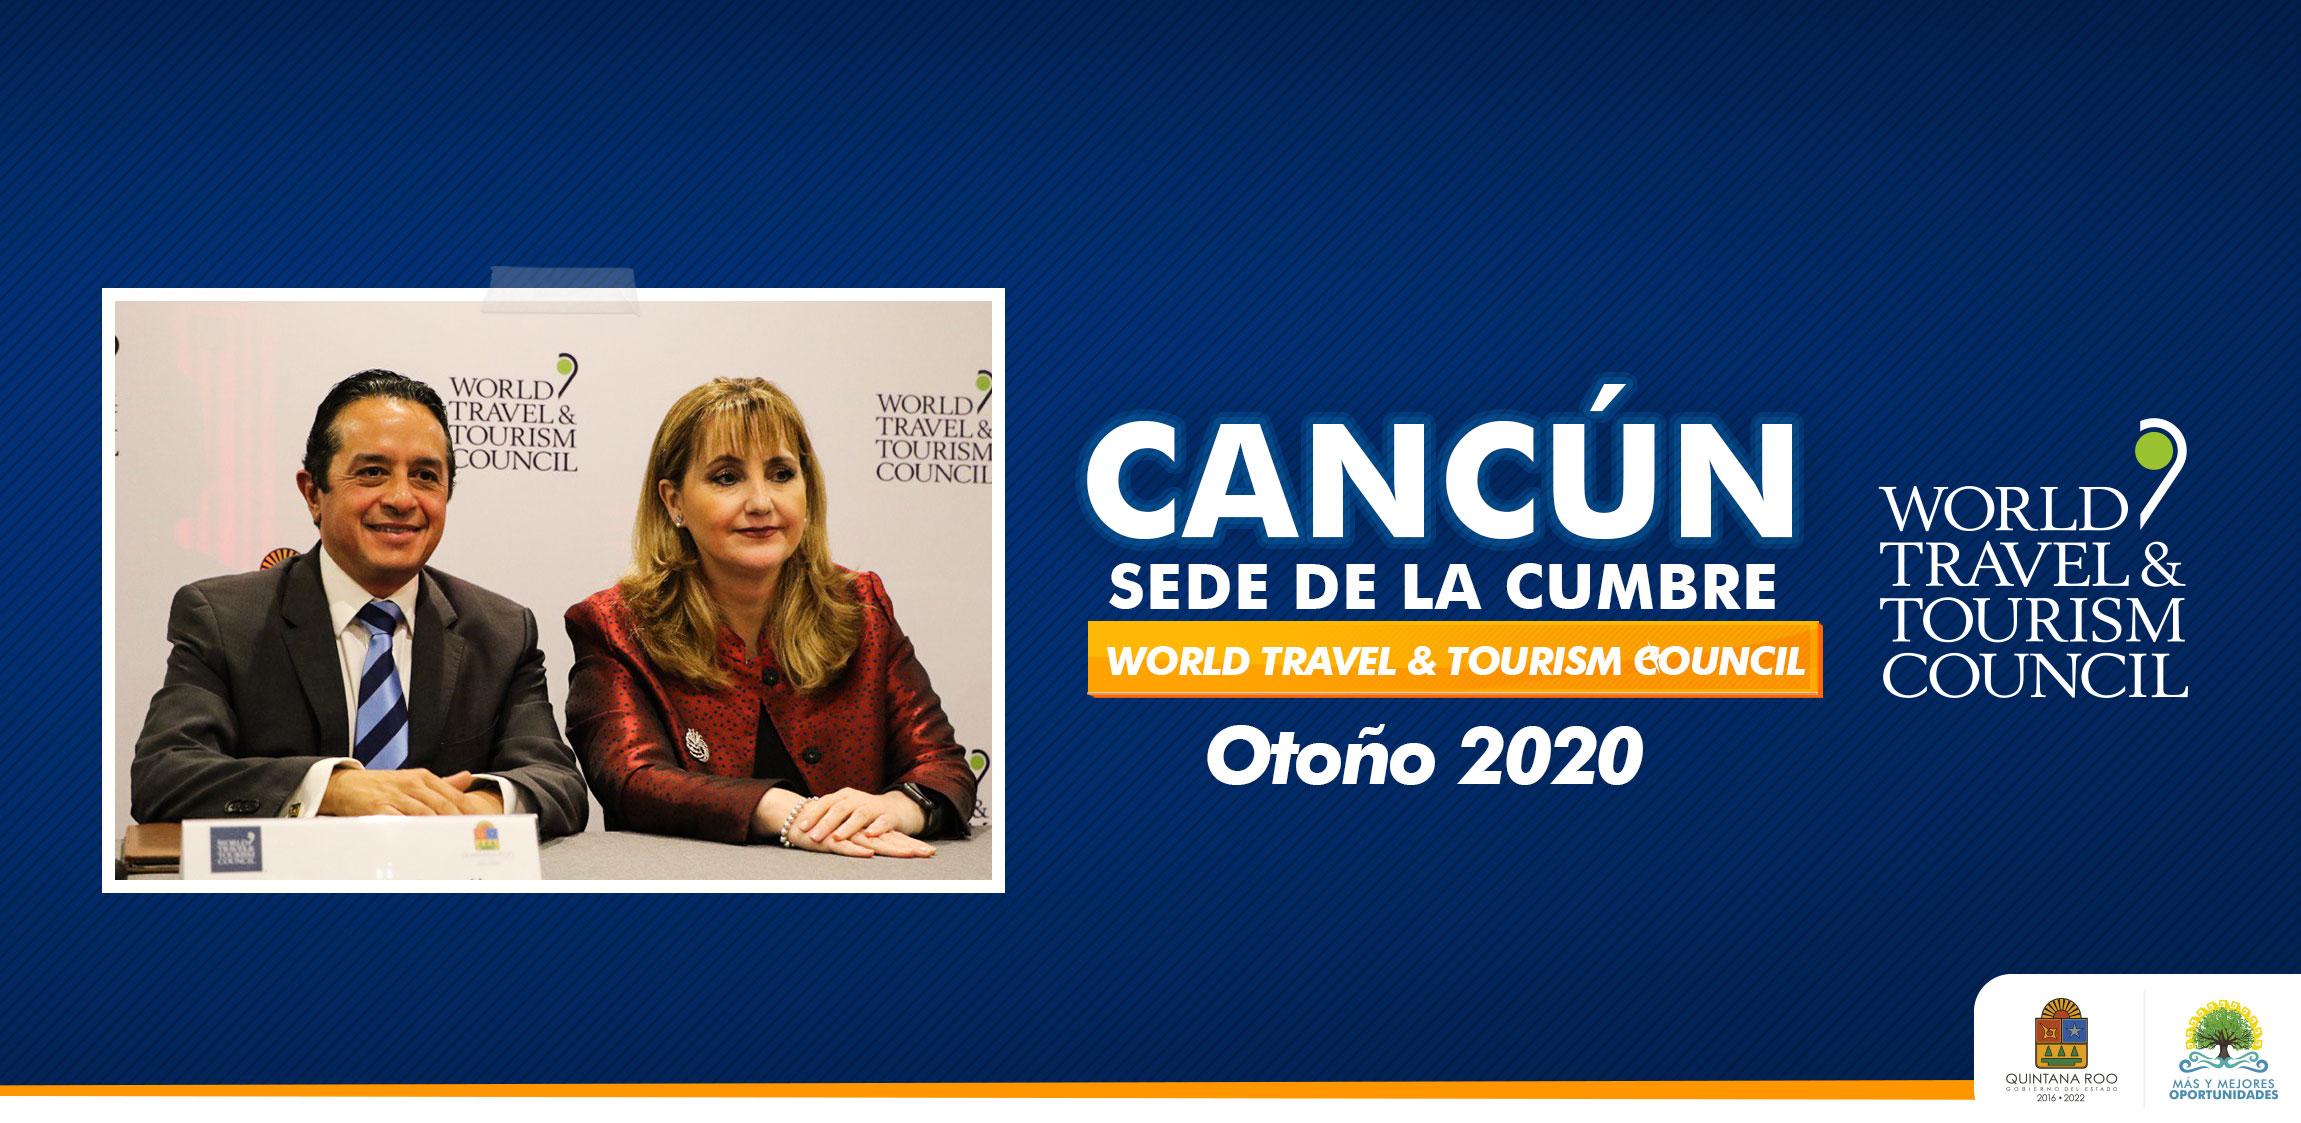 eligen-a-cancun-como-sede-de-la-cumbre-mundial-del-turismo-2020